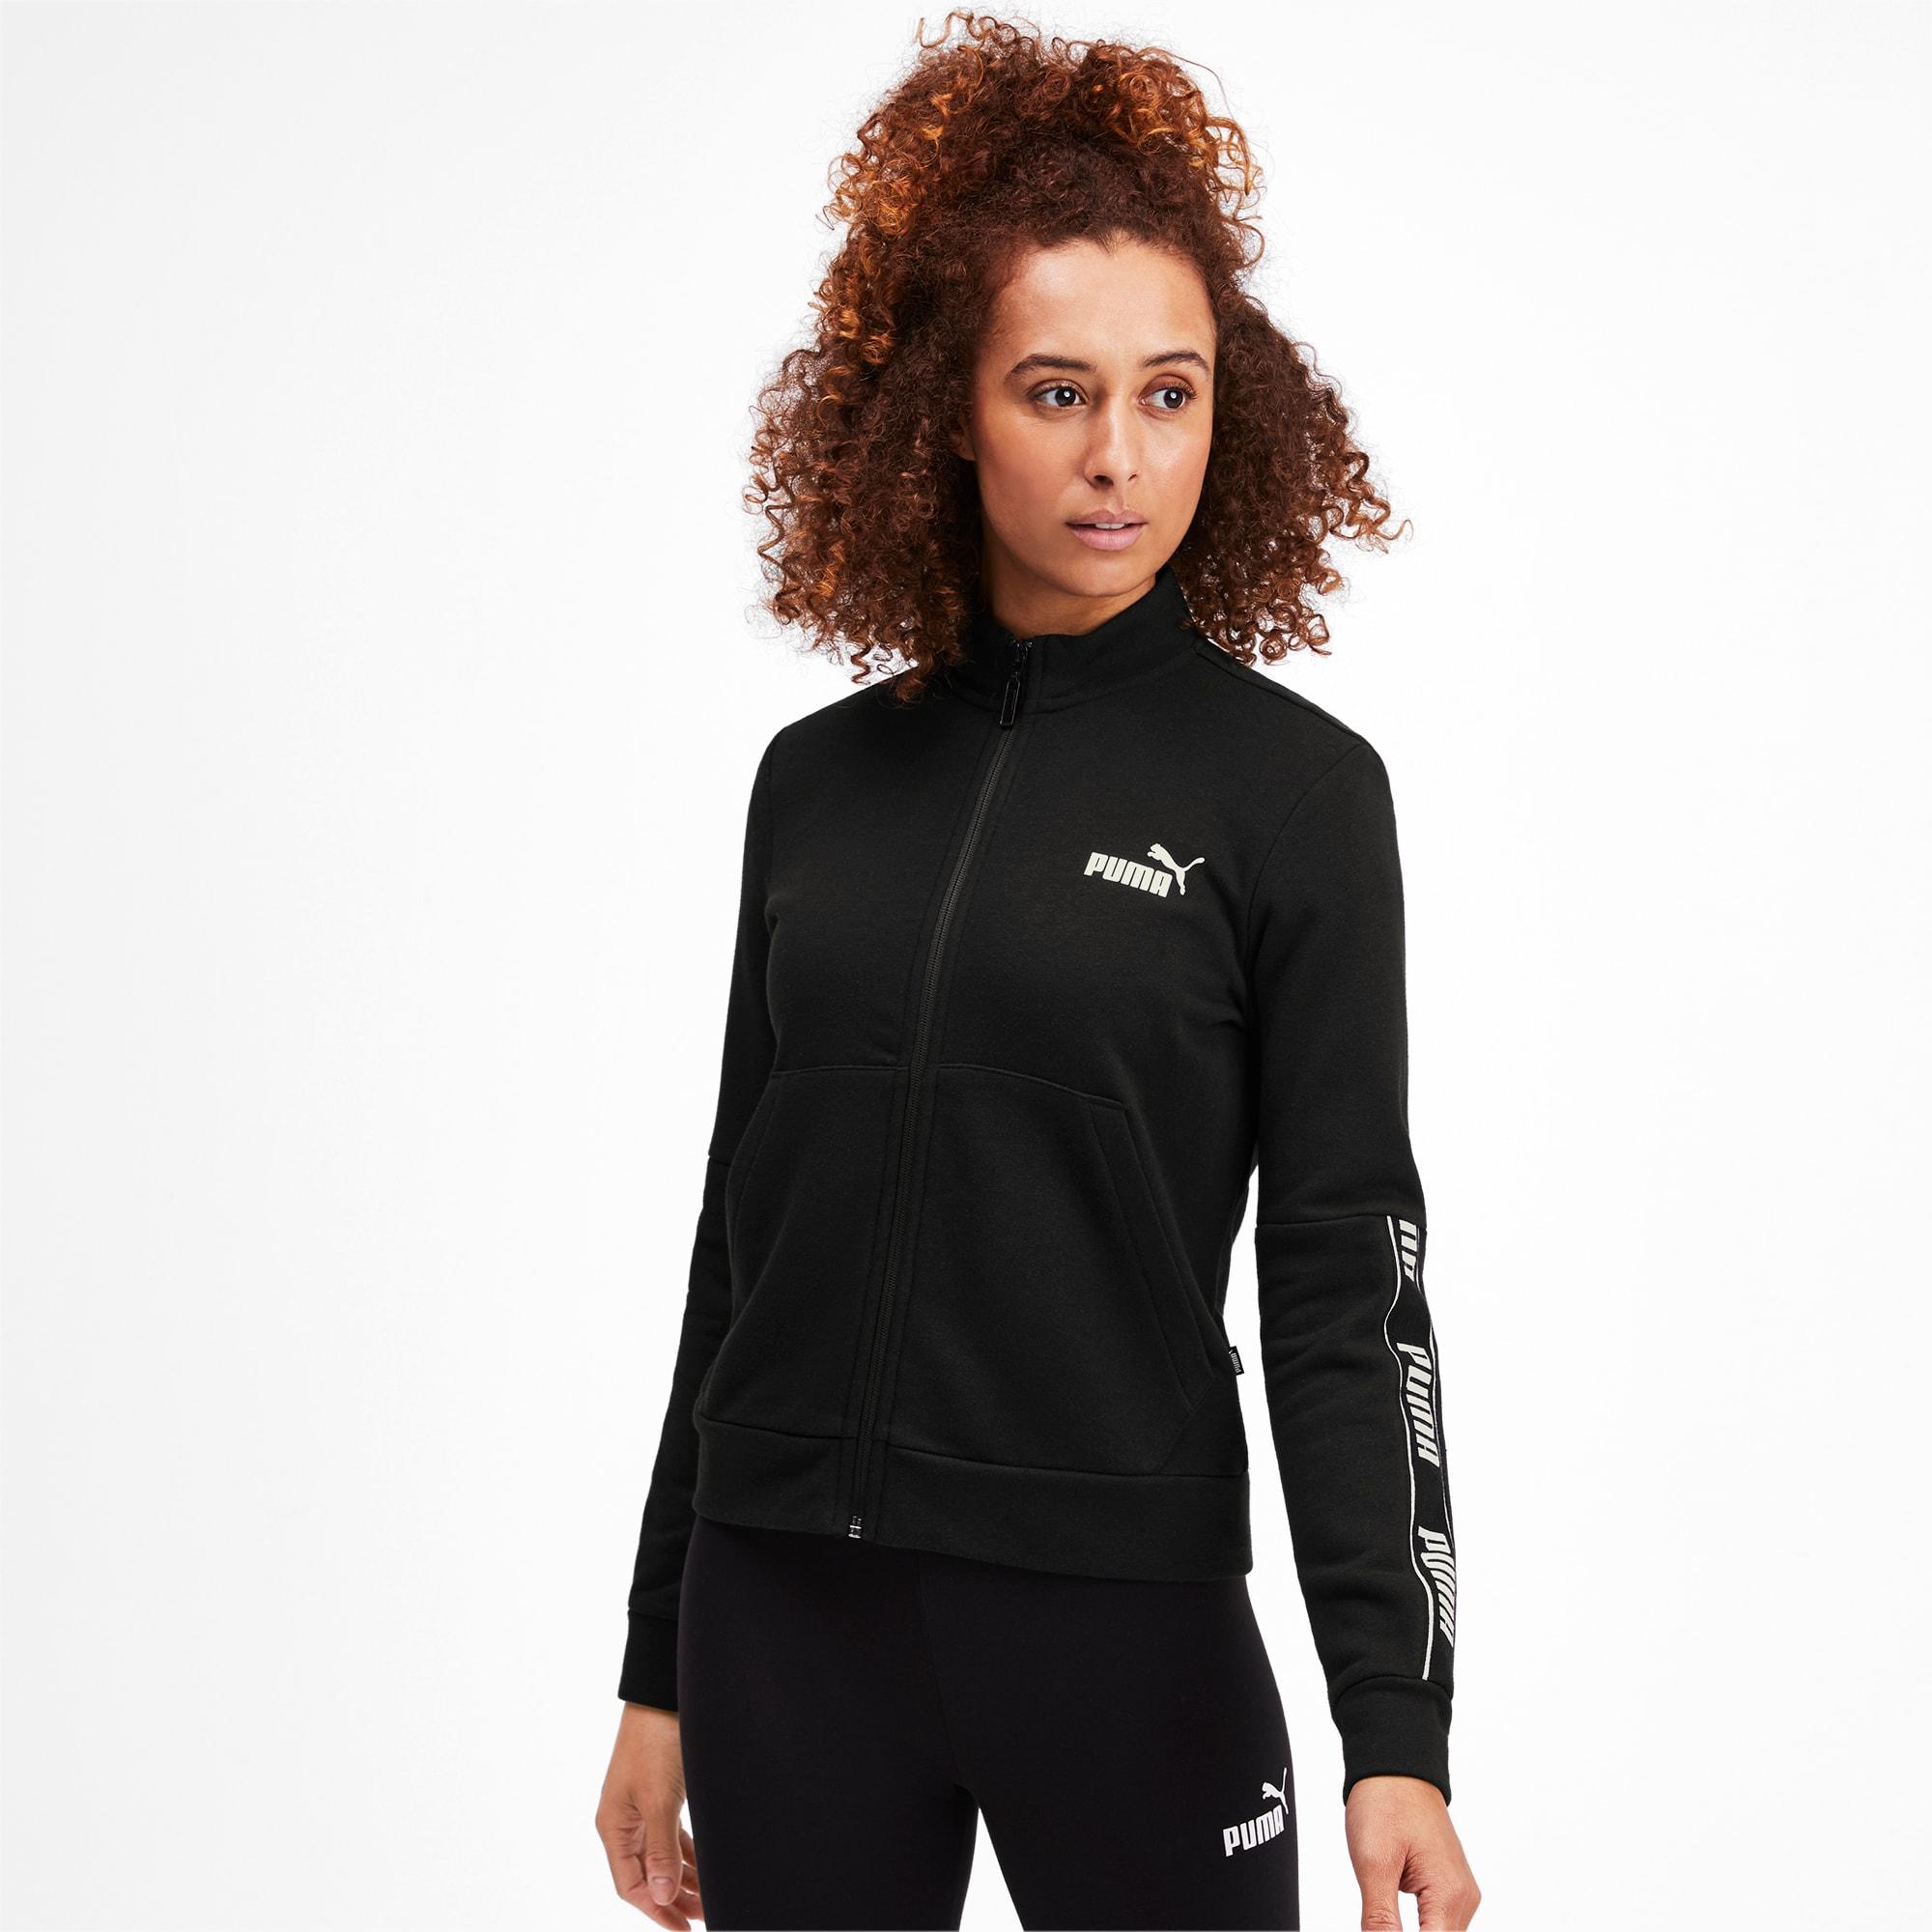 Amplified Women's Full Zip Jacket